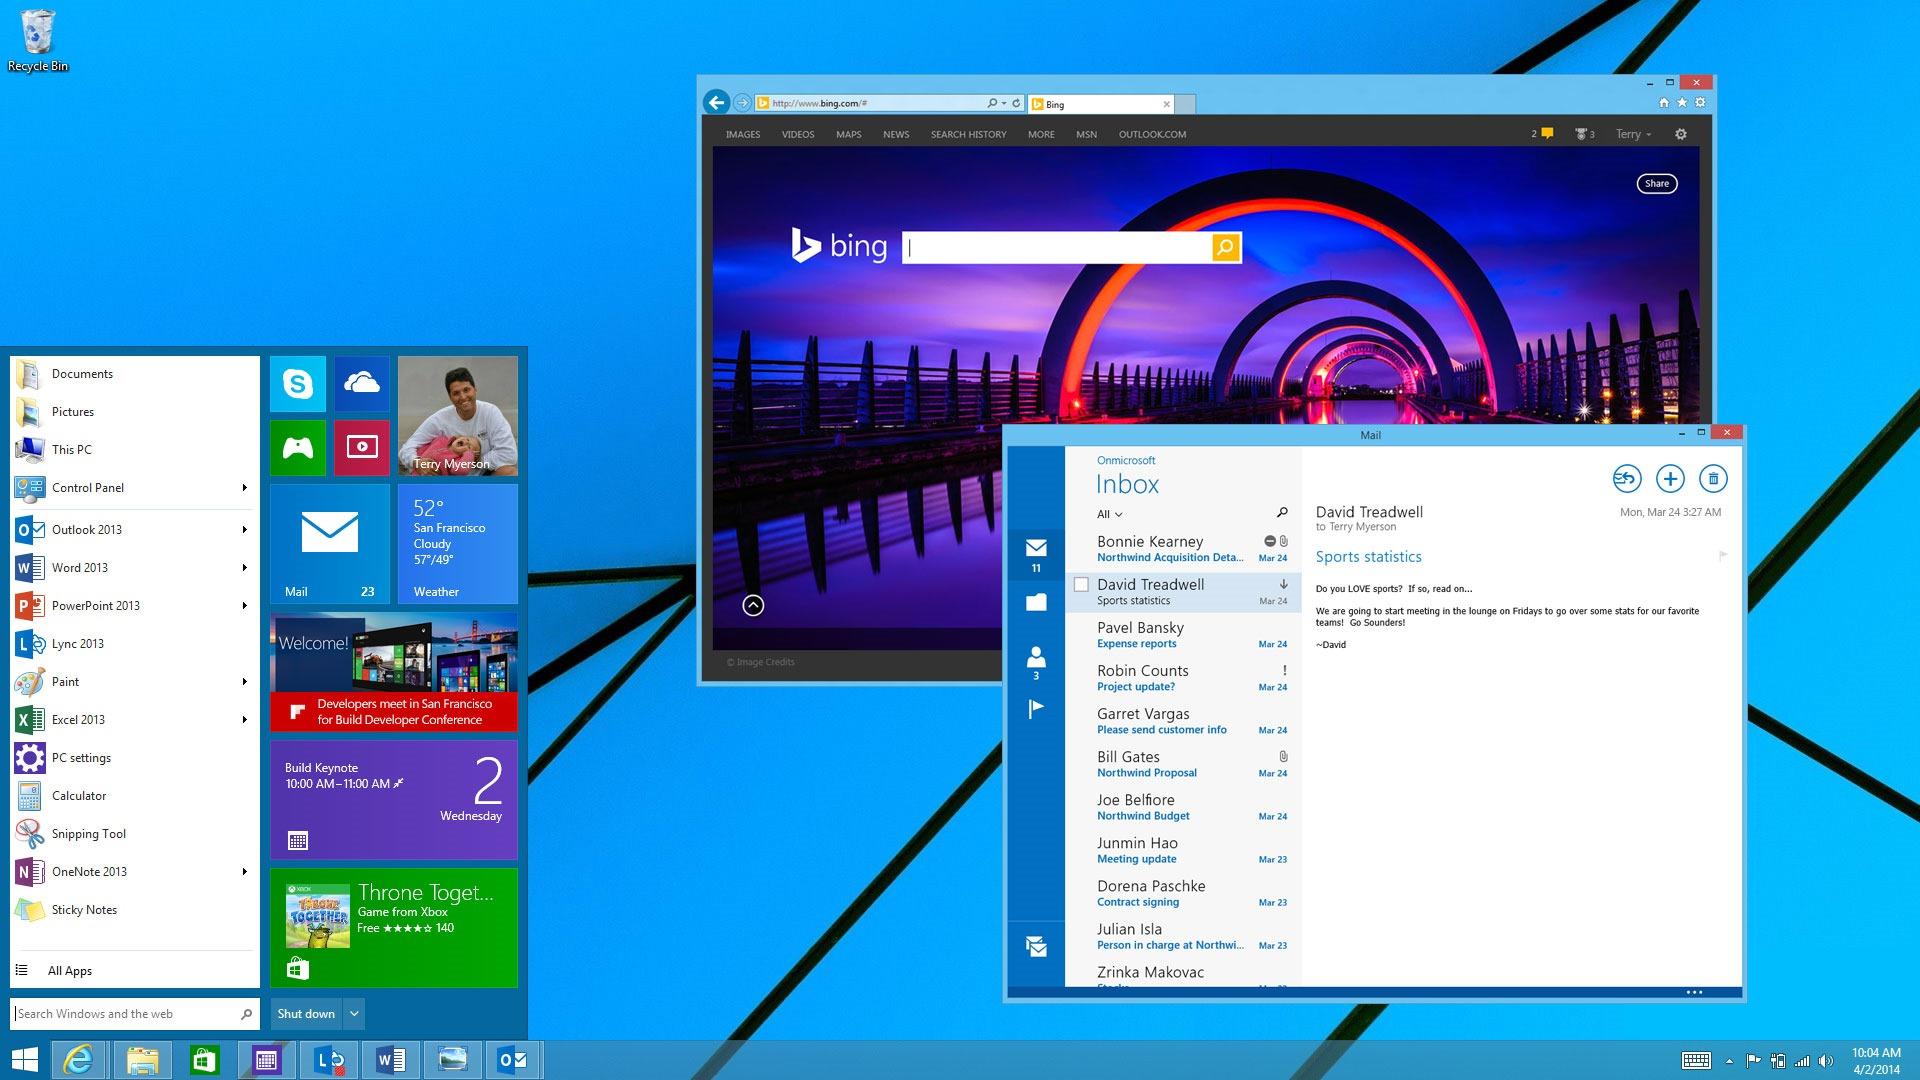 1920x1080 > Windows 8.1 Wallpapers